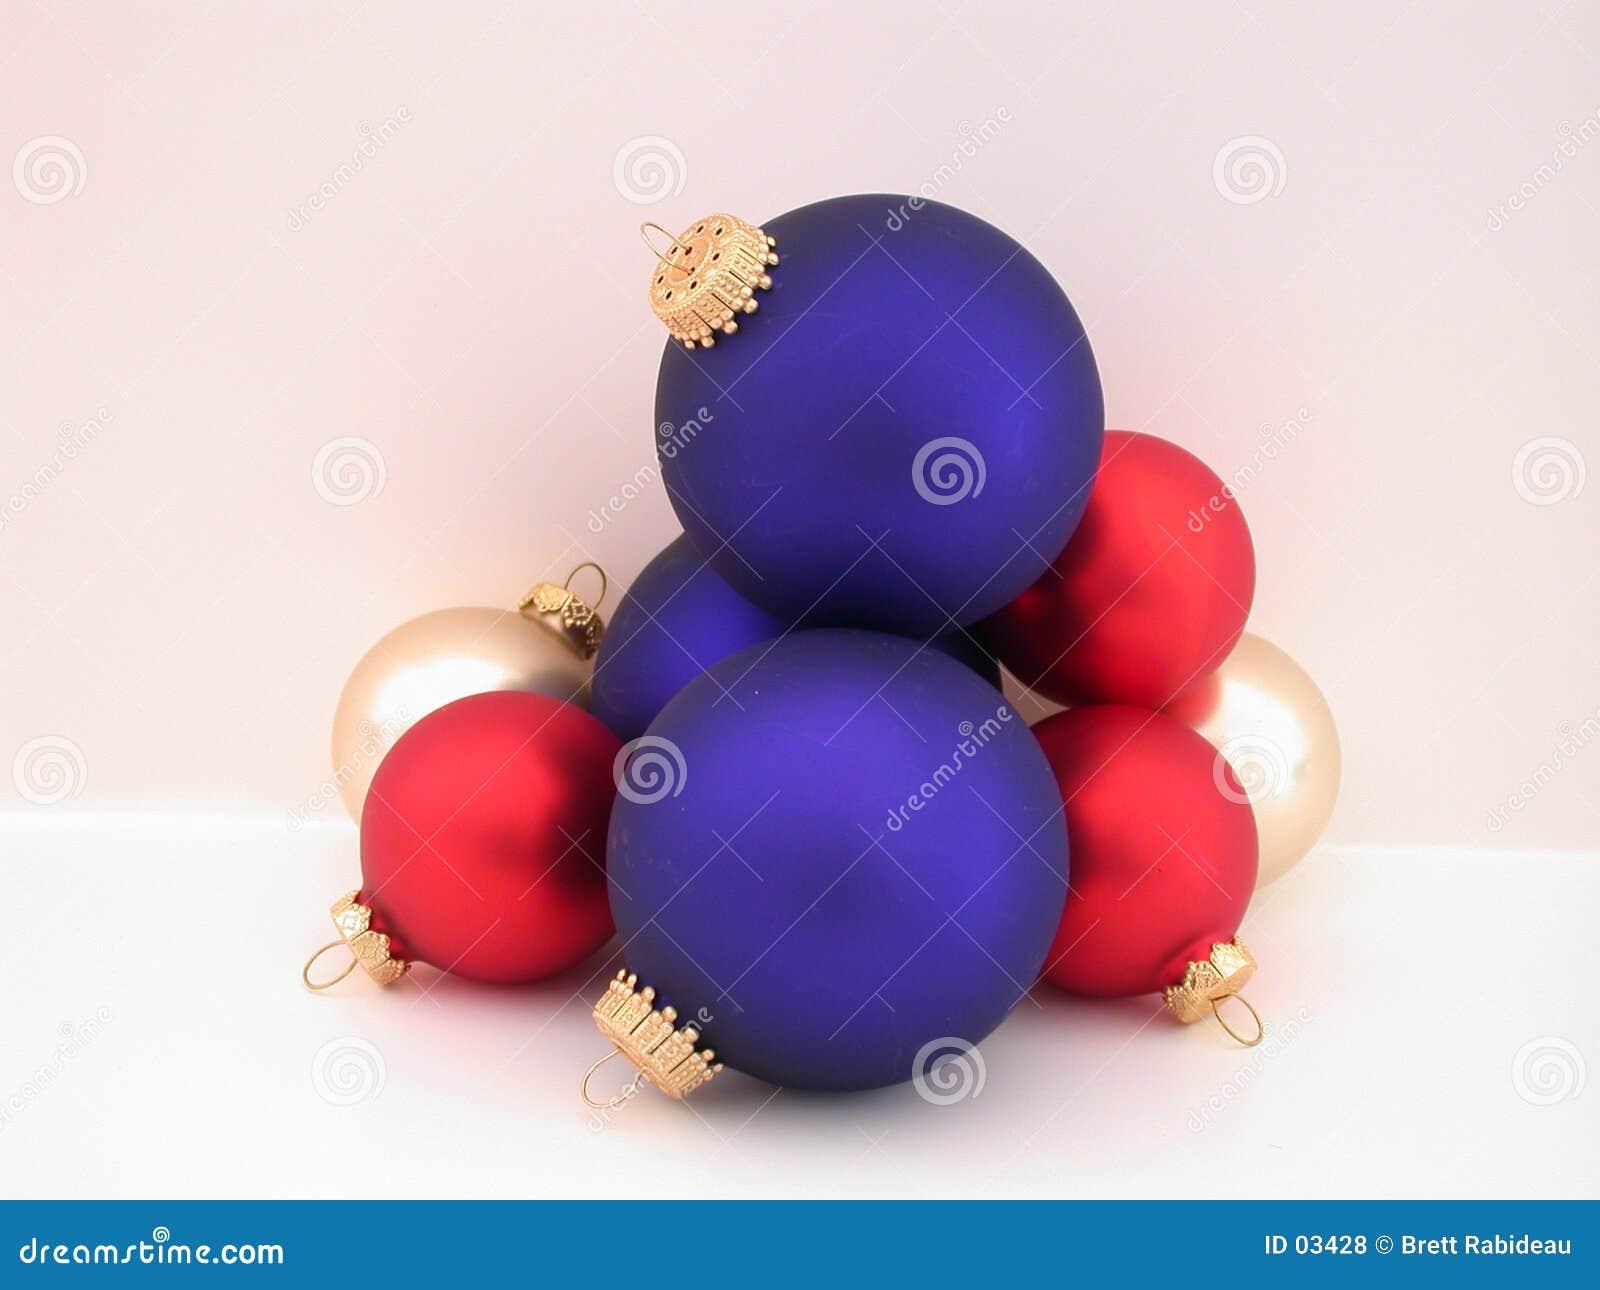 Red, White, & Blue Christmas Bulbs